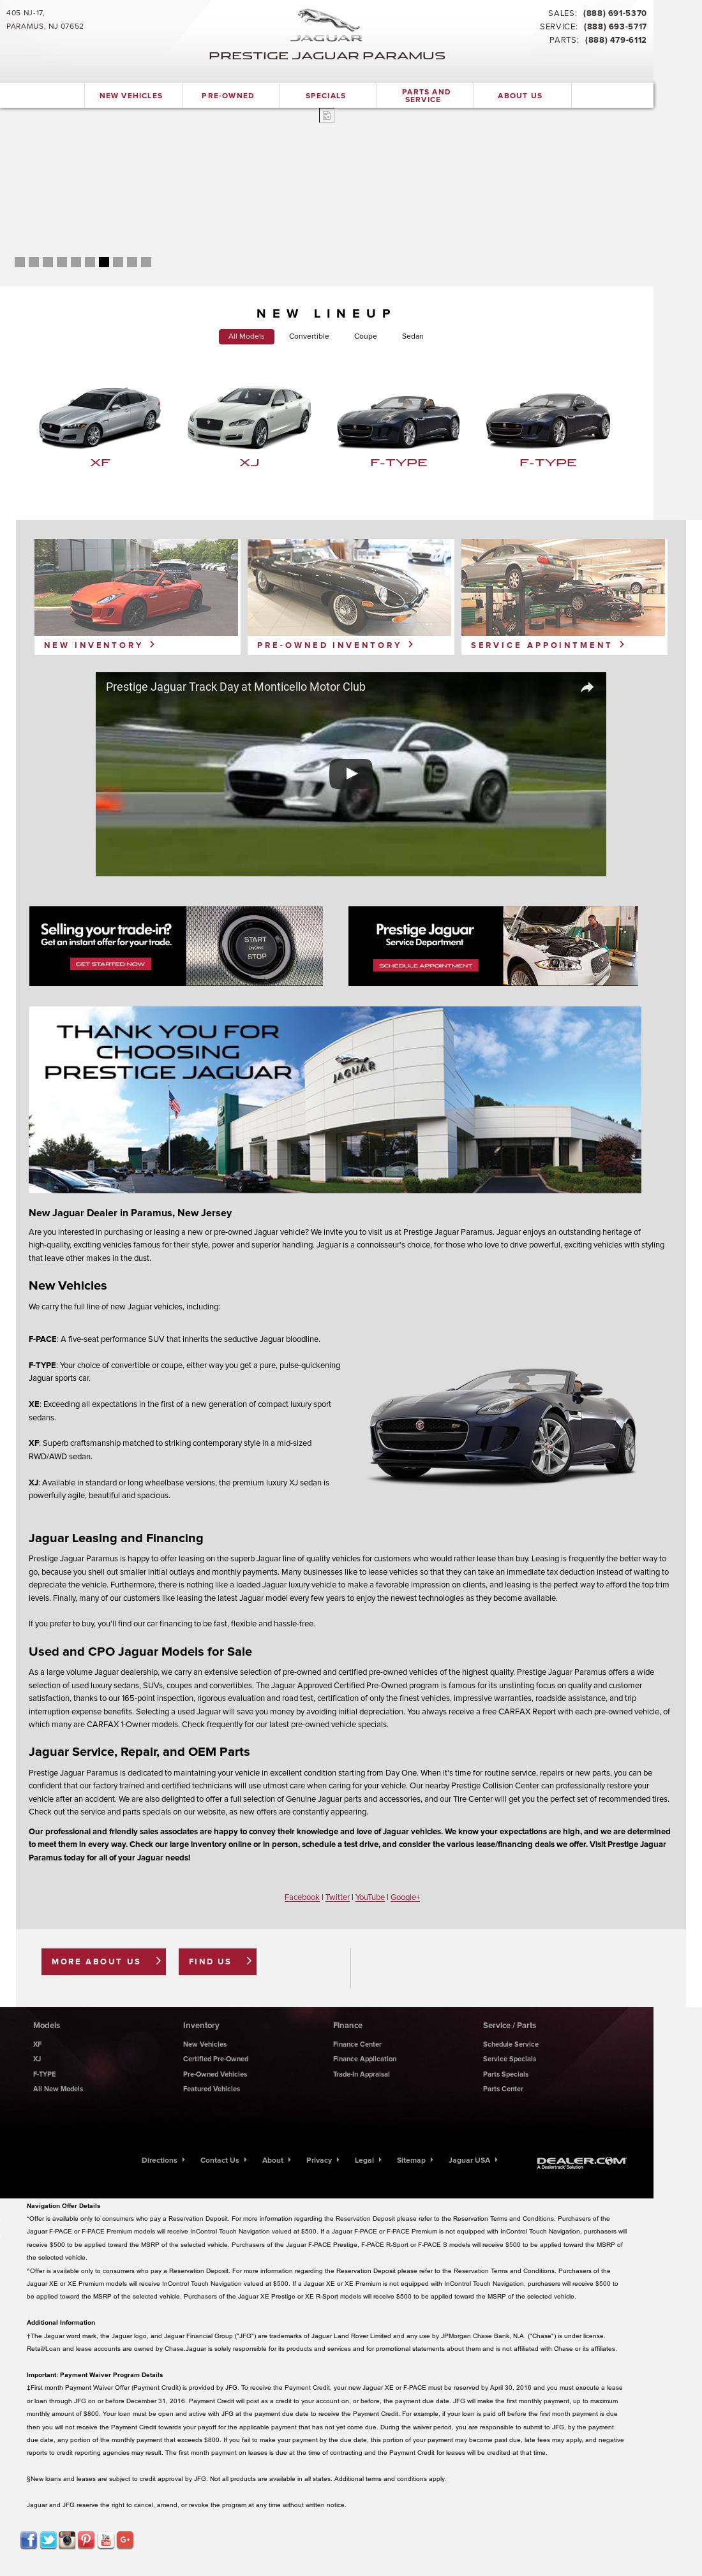 r nj jaguar large groovecar composite xj research sport supercharged metallic ingot sedan